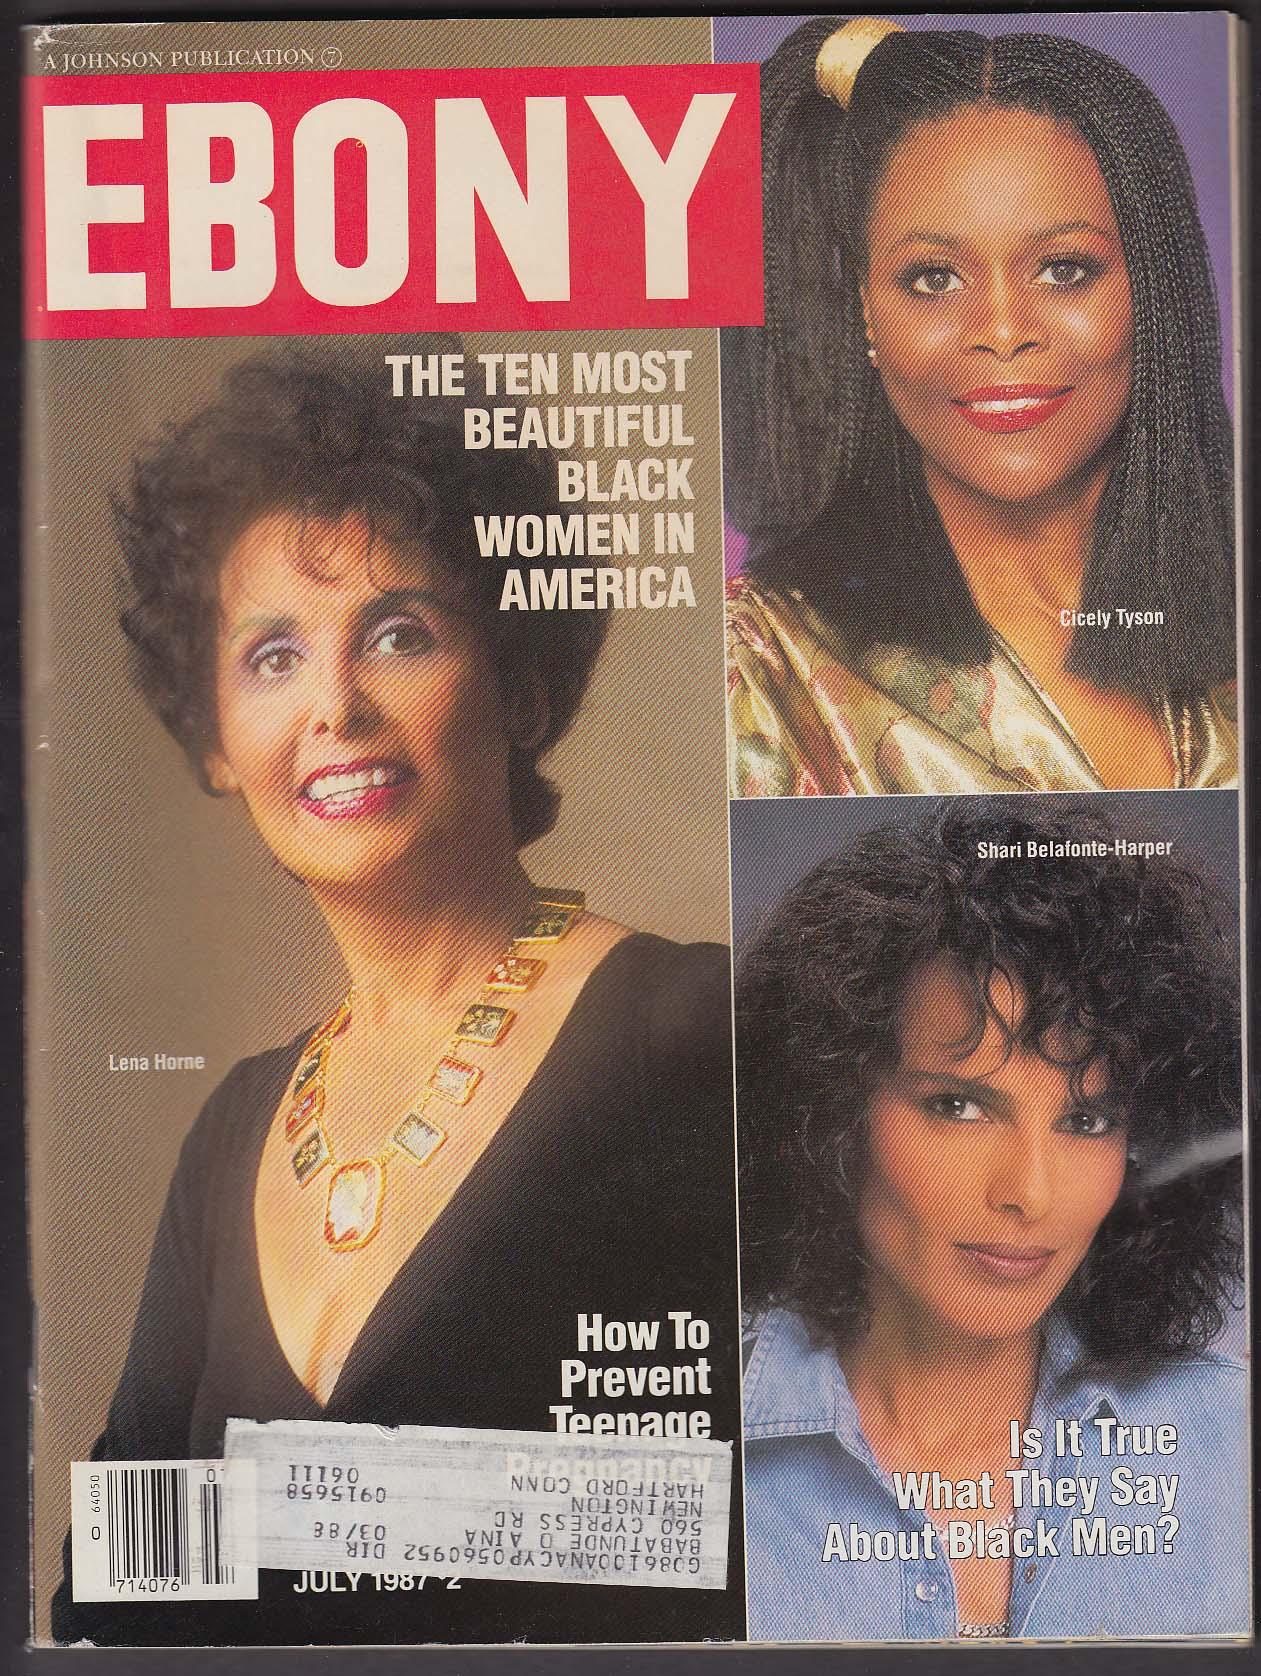 EBONY Lena Horne Cicely Tyson Shari Belafonte-Harper 7 1987